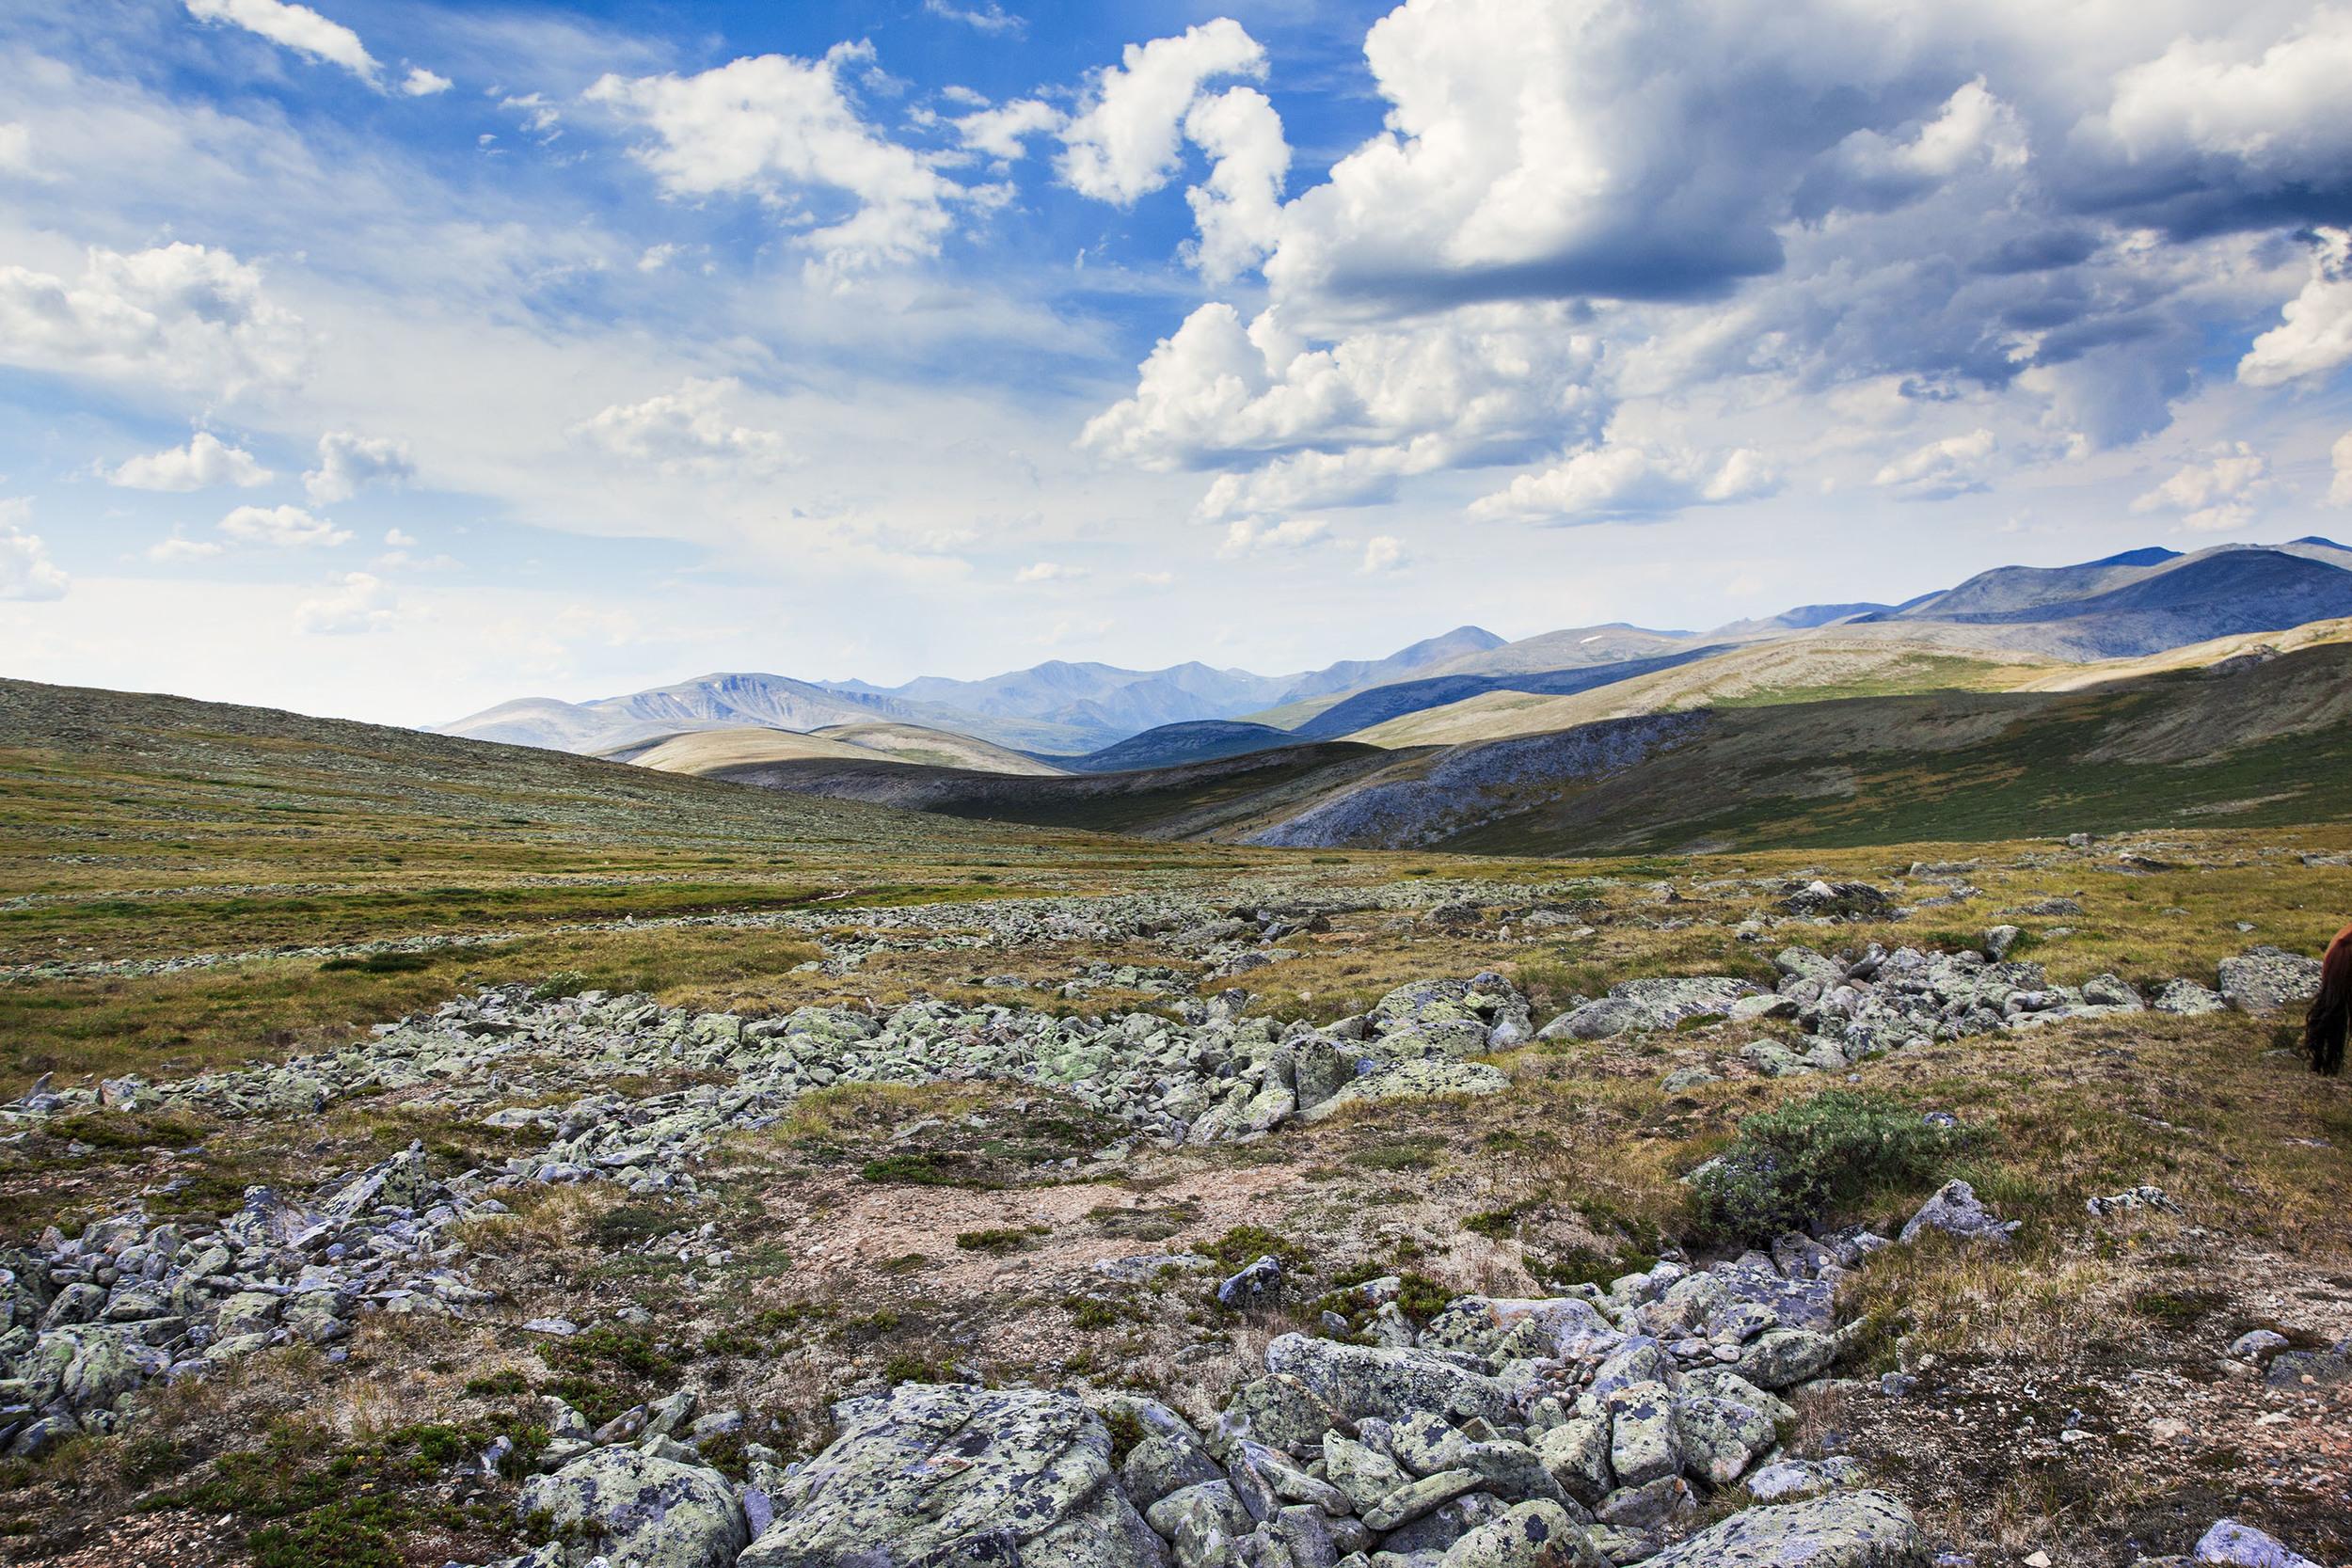 JennieRoss_mongolia_basin_valley1.jpg